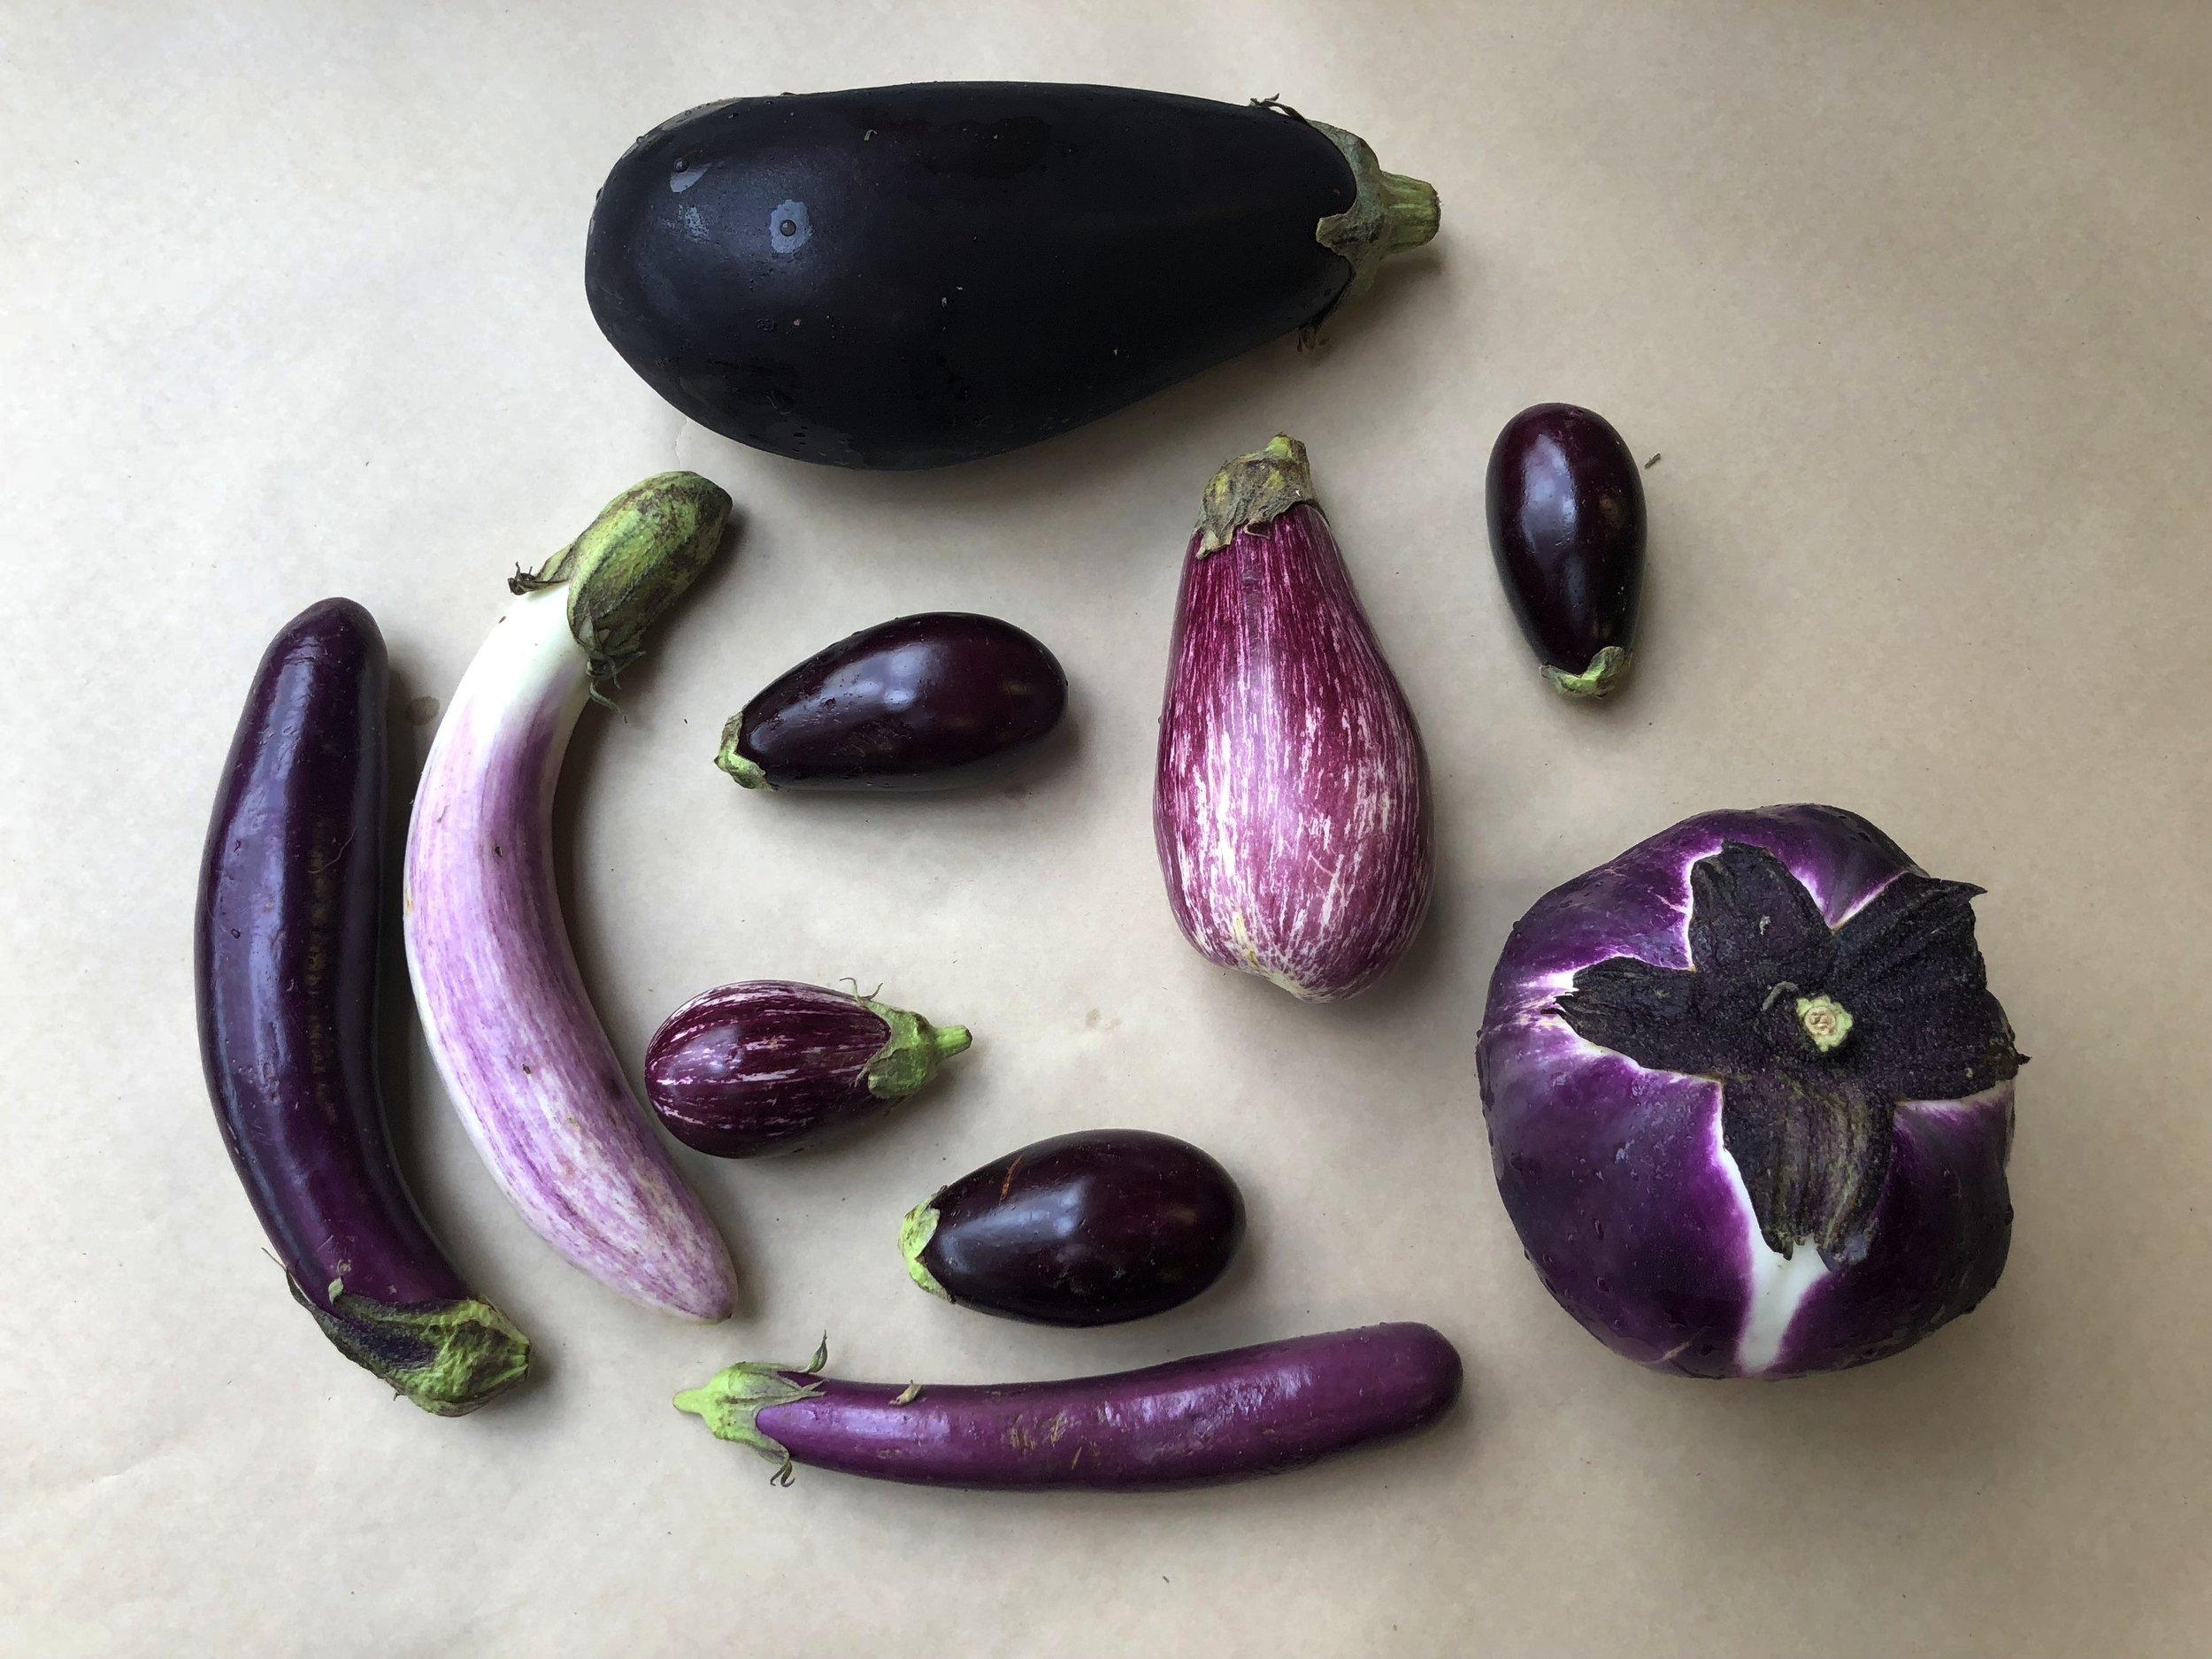 Fresh picked local eggplants including Italian, Bride, Calliope, Purple, Sicilian, Finger and Neon varieties